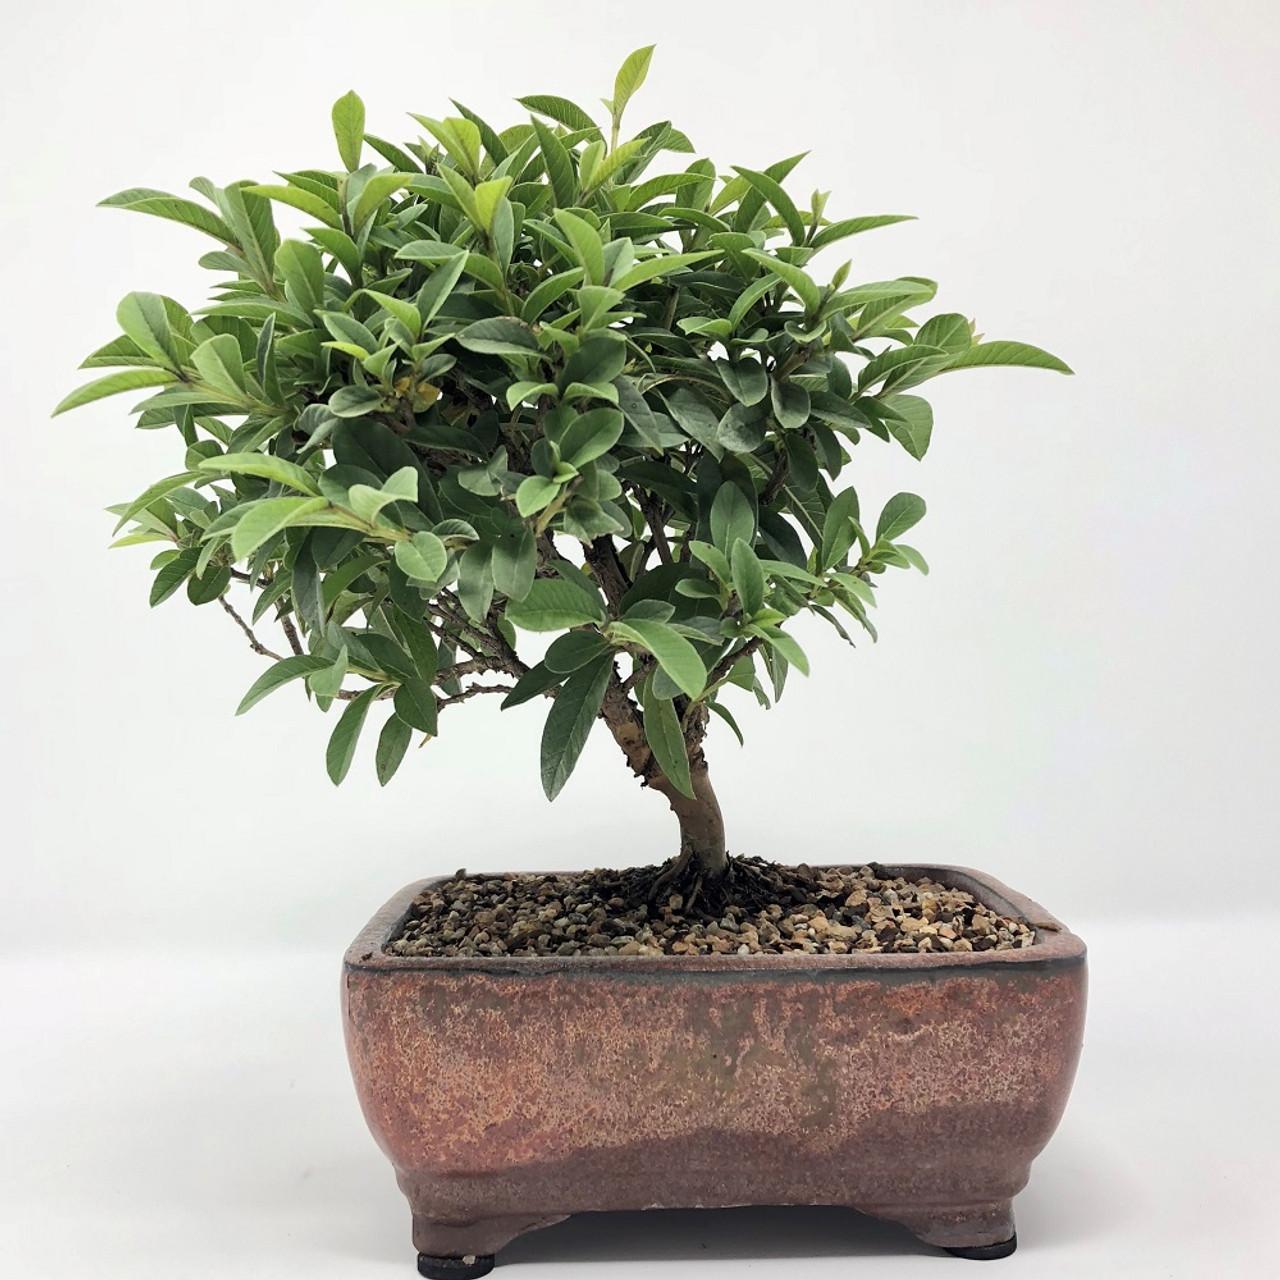 Rare Micro Dwarf Leaf Dwarf Guava Bonsai Tree Bonsai Outlet